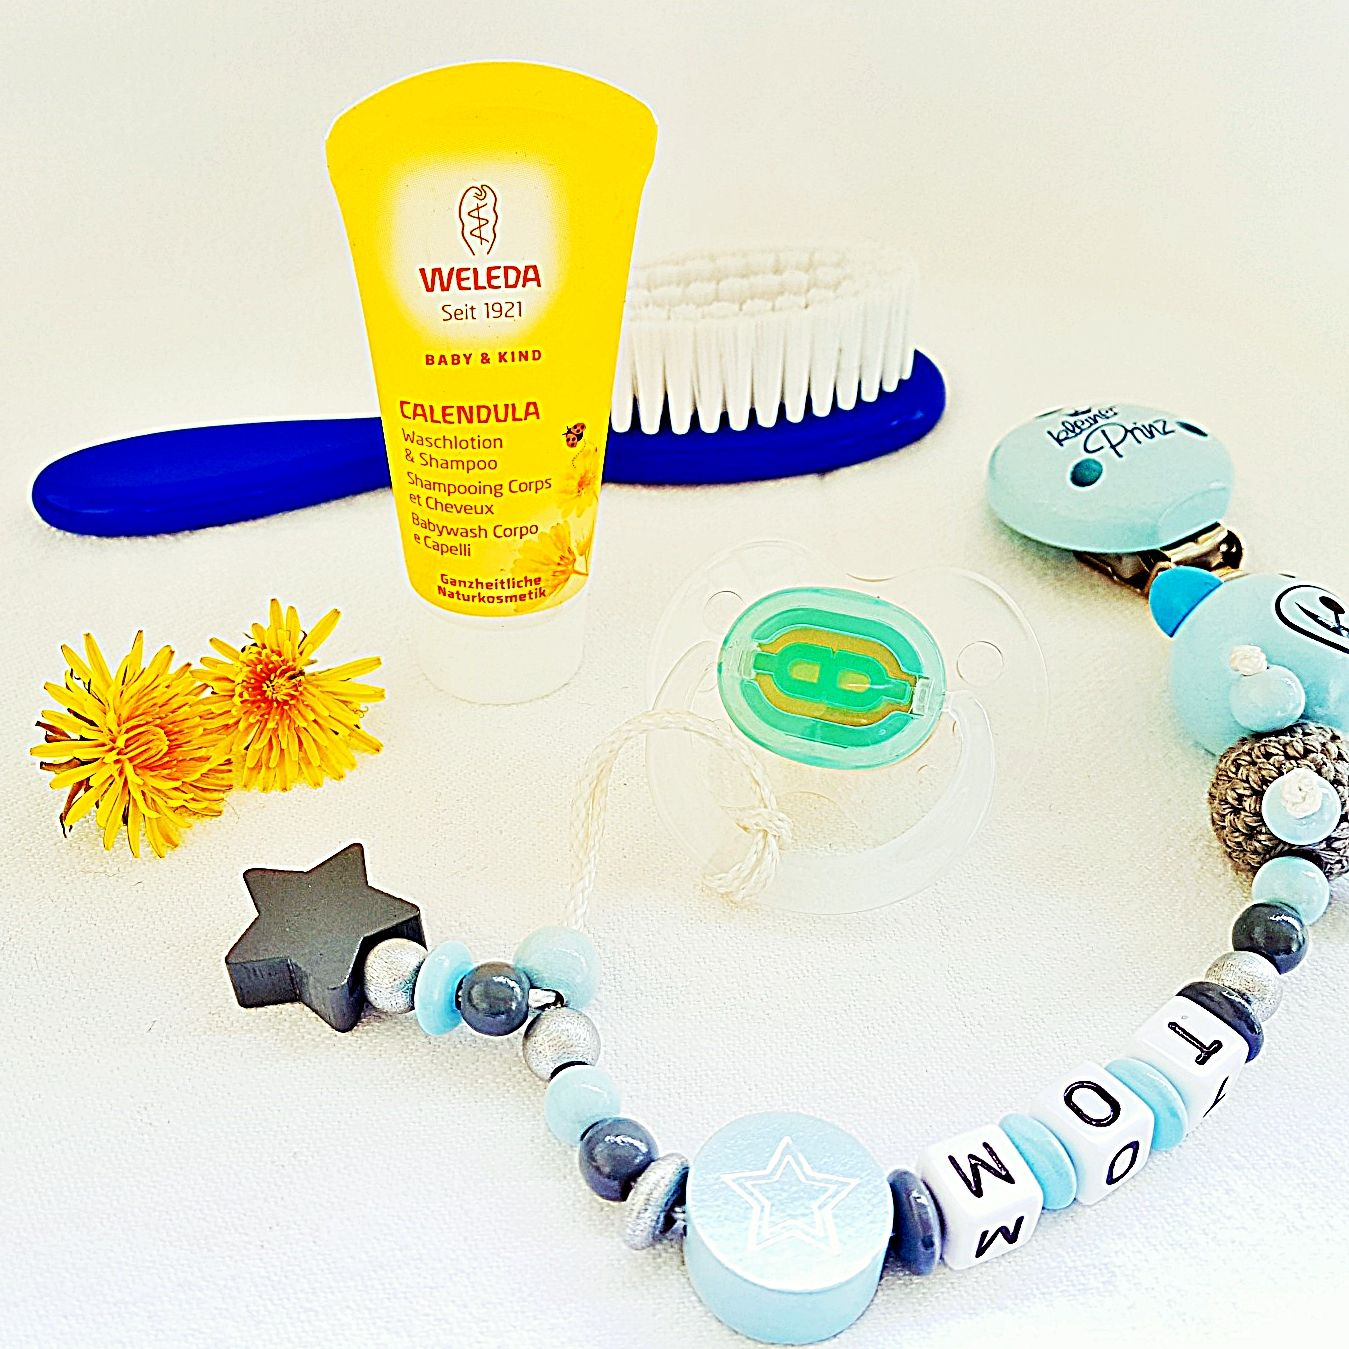 Calendula Waschlotion & Shampoo Erfahrung